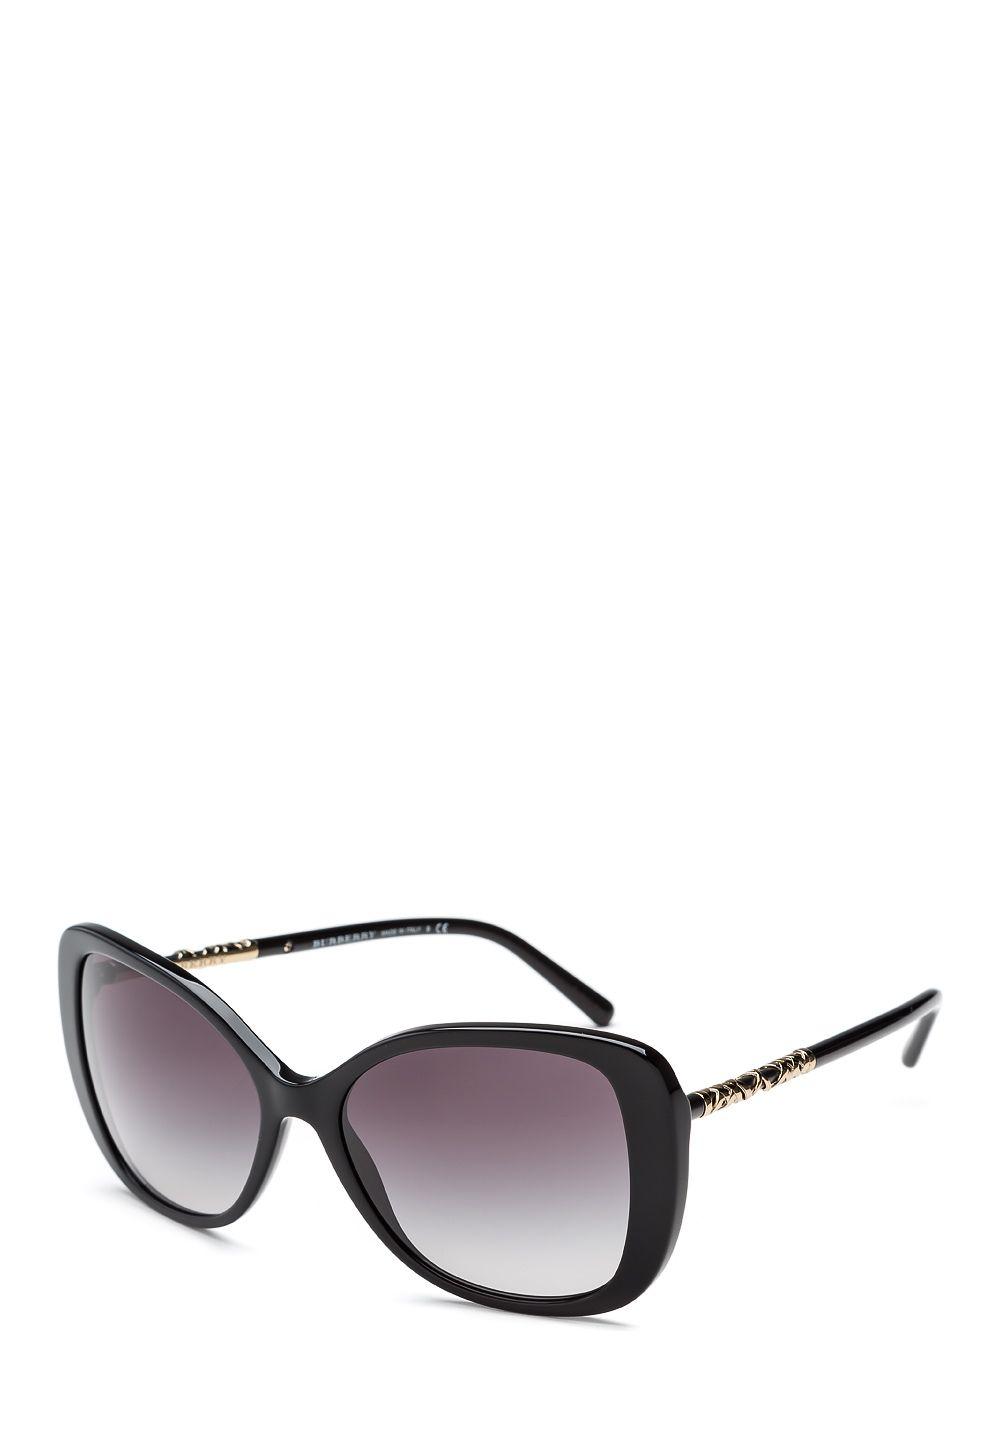 83fb0d99d573 Burberry Burberry Sunglasses Black B4238 Price in Egypt